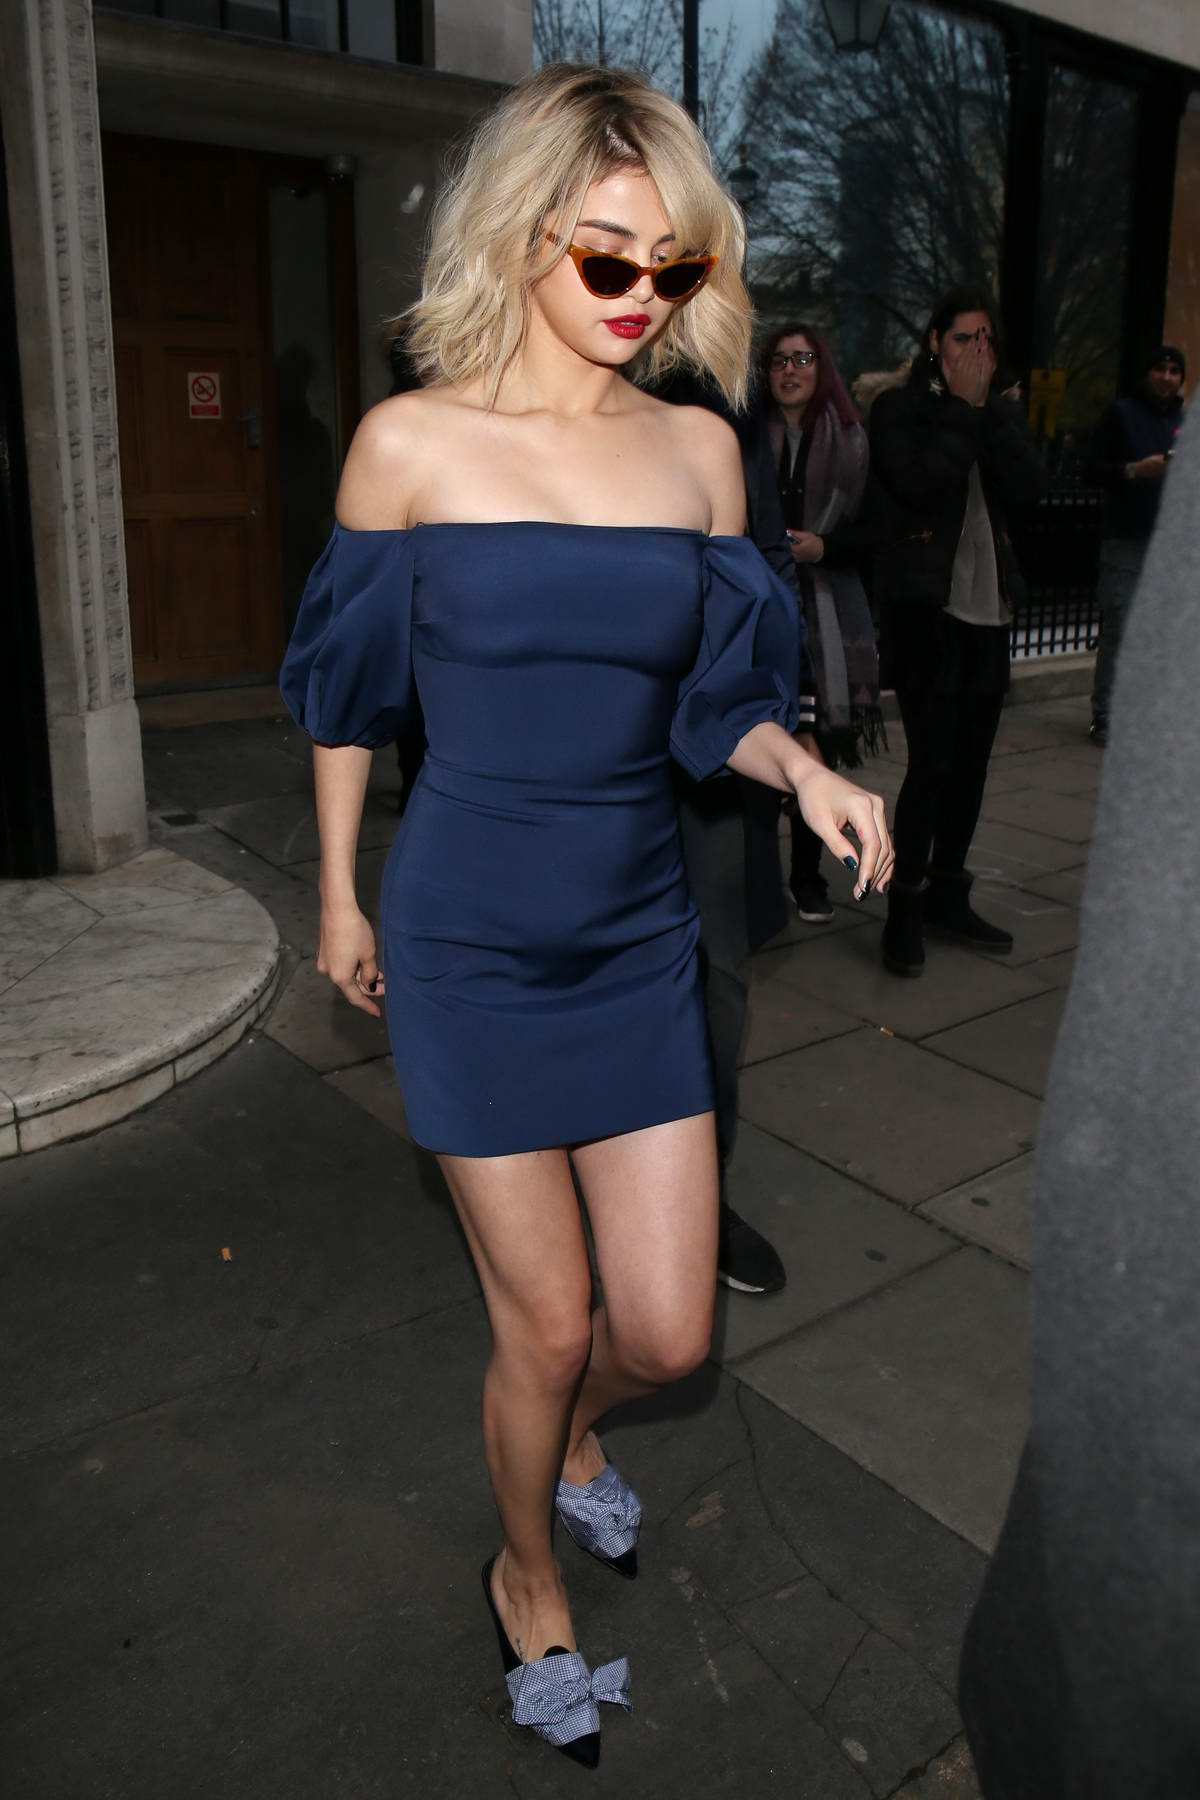 Selena Gomez spotted outside BBC Radio 1 in London